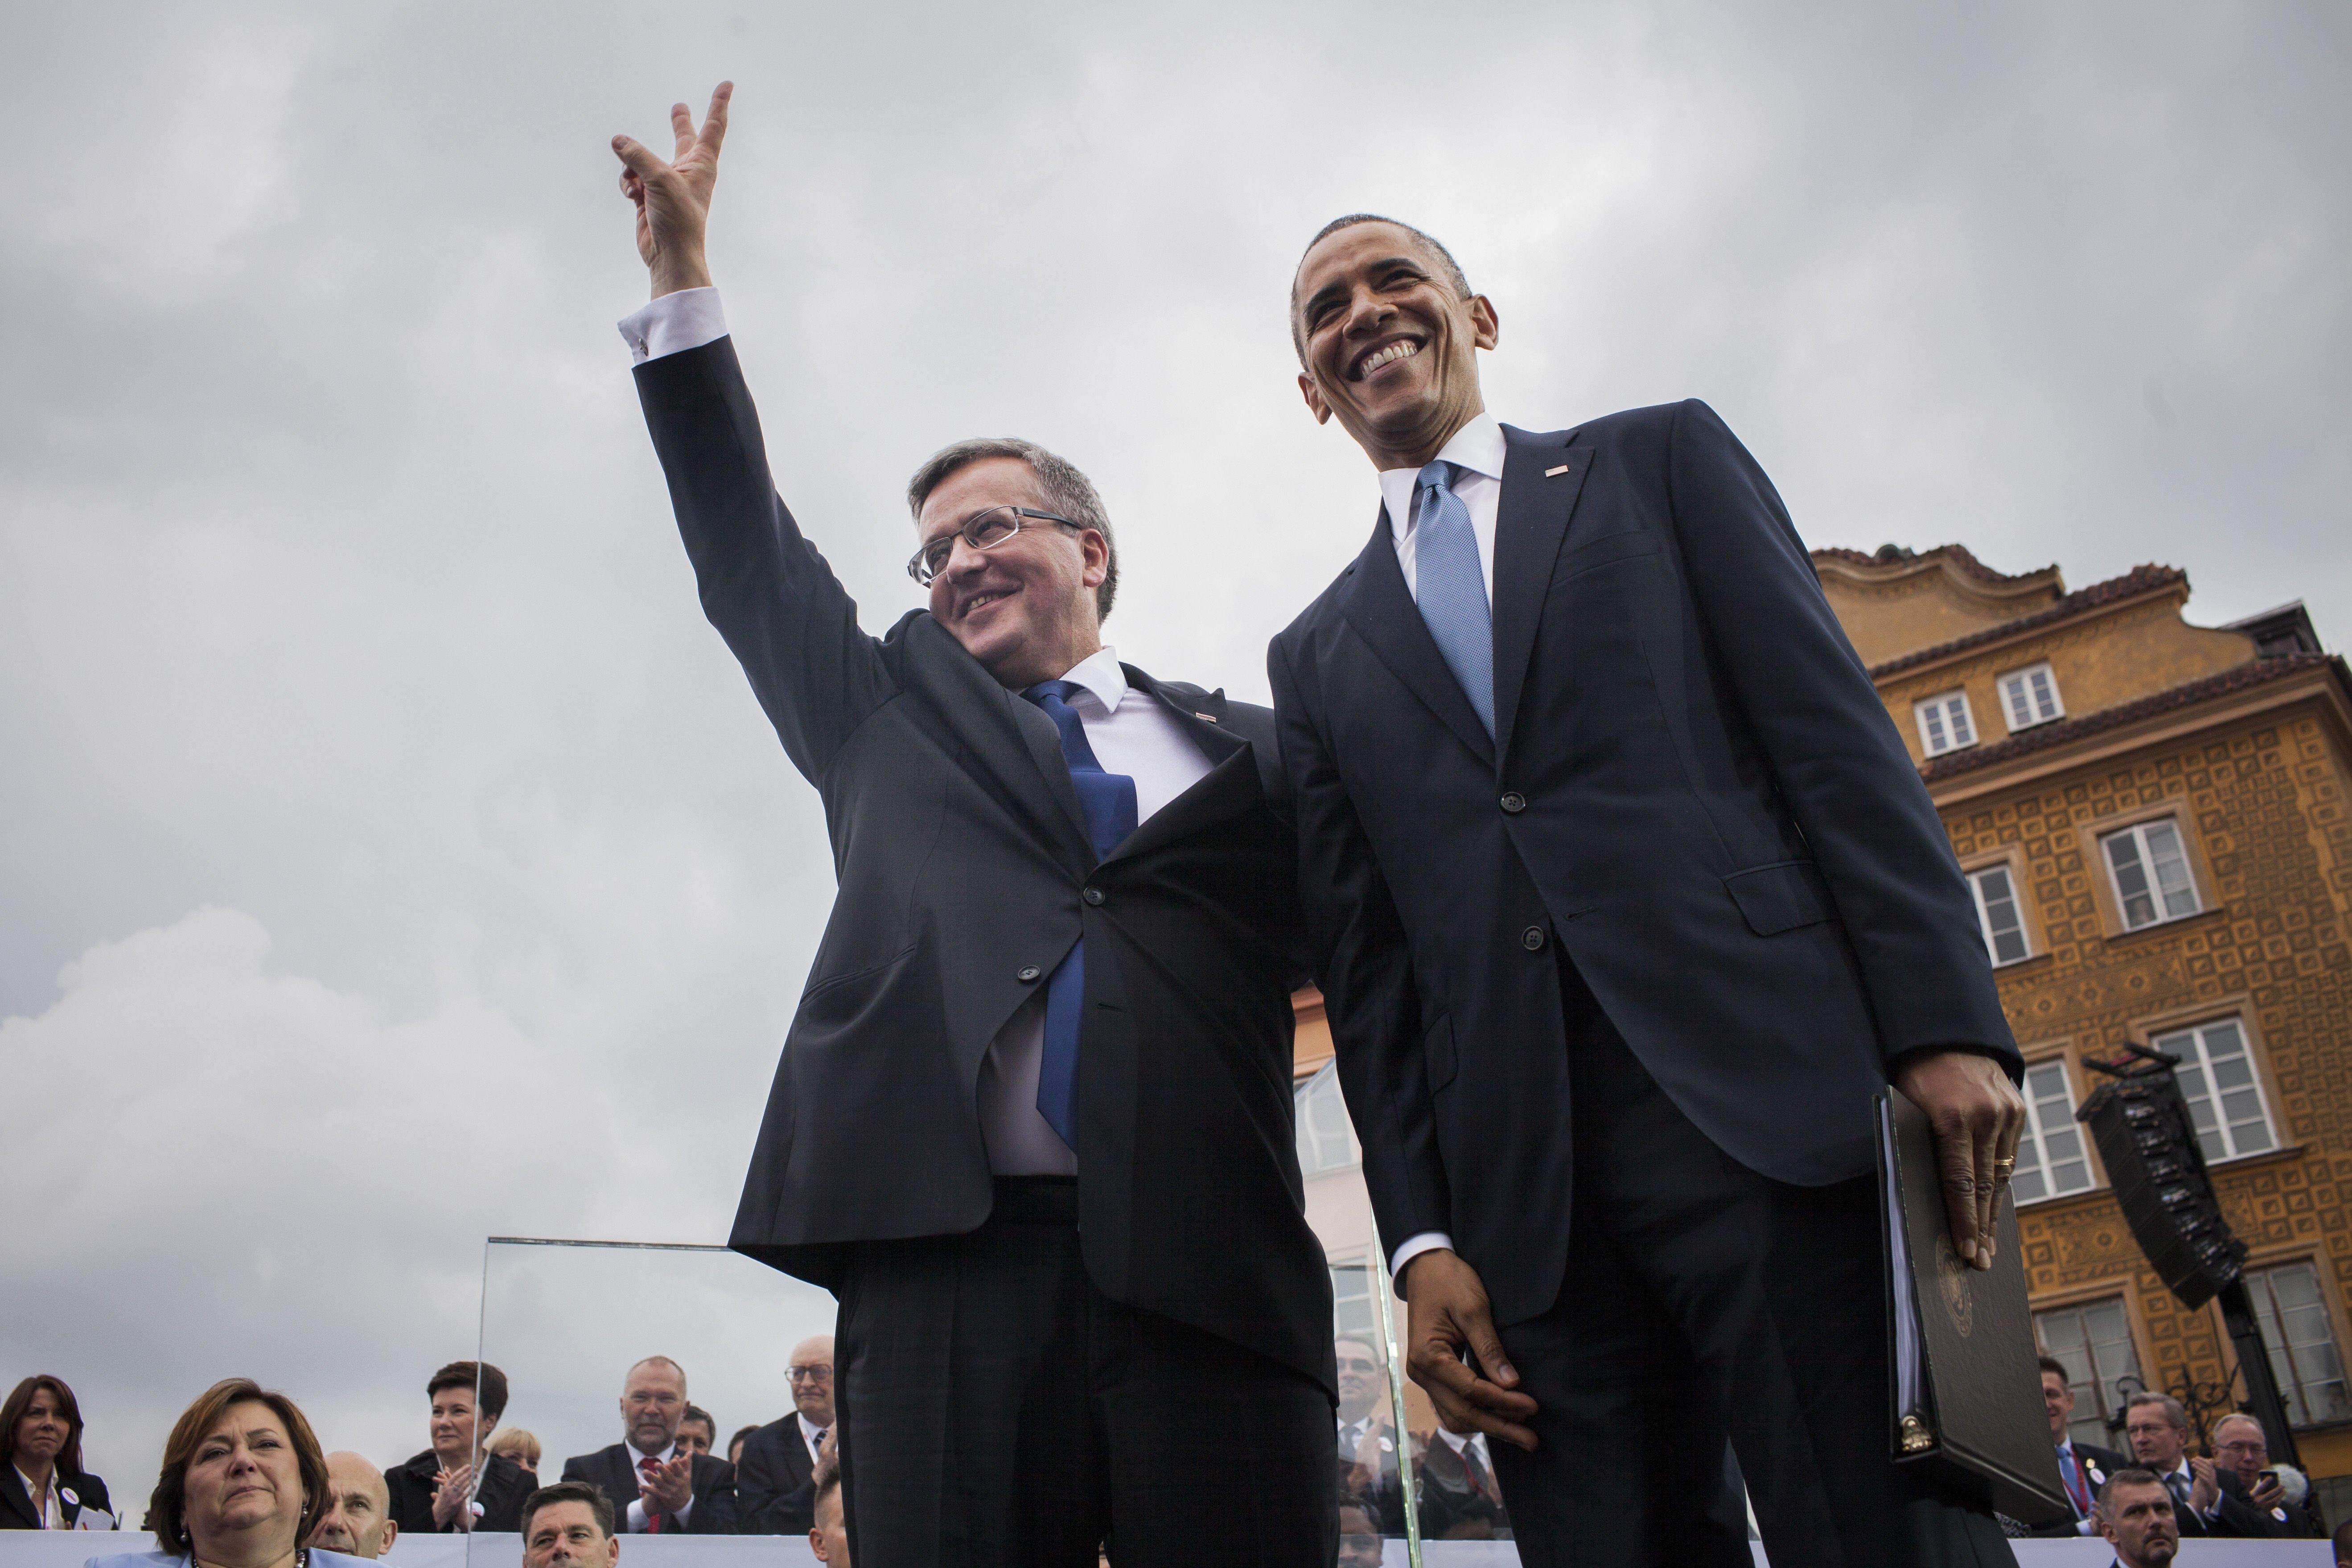 U.S. President Barack Obama and Polish President Bronislaw Komorowski during a speech to mark 25 years of Polish democracy in Warsaw on June 4, 2014.